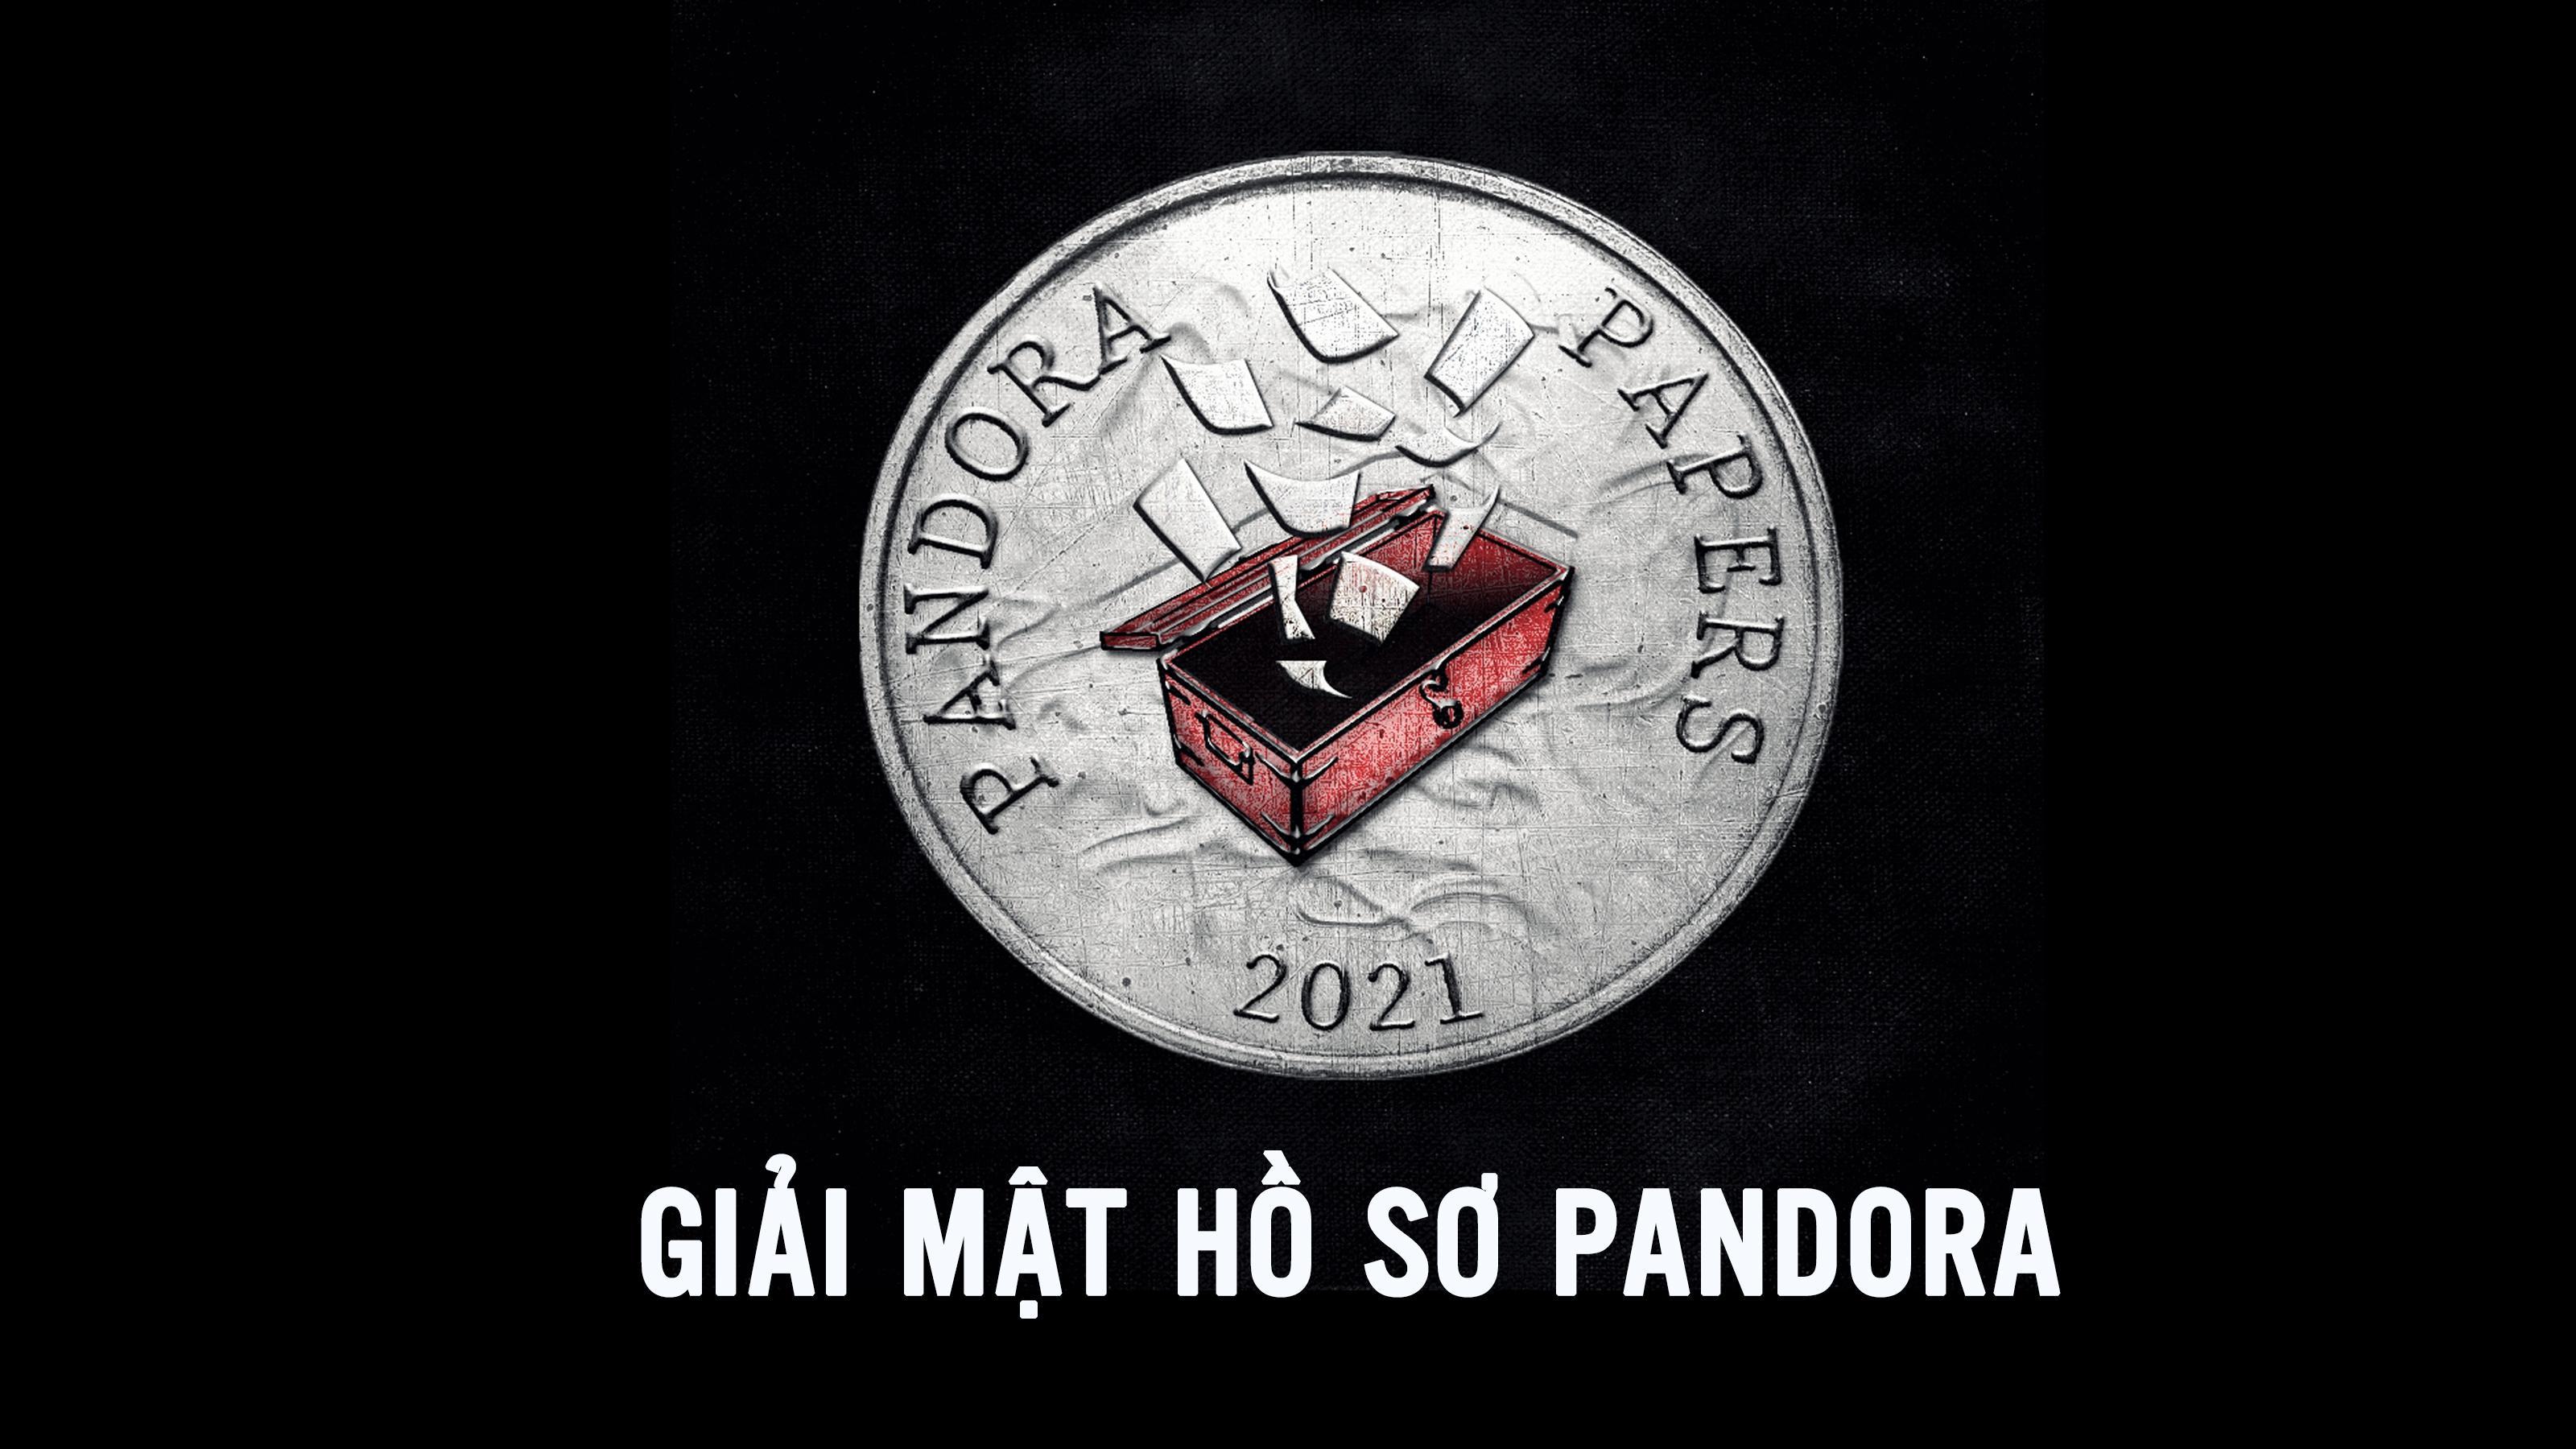 Giải mật Hồ sơ Pandora